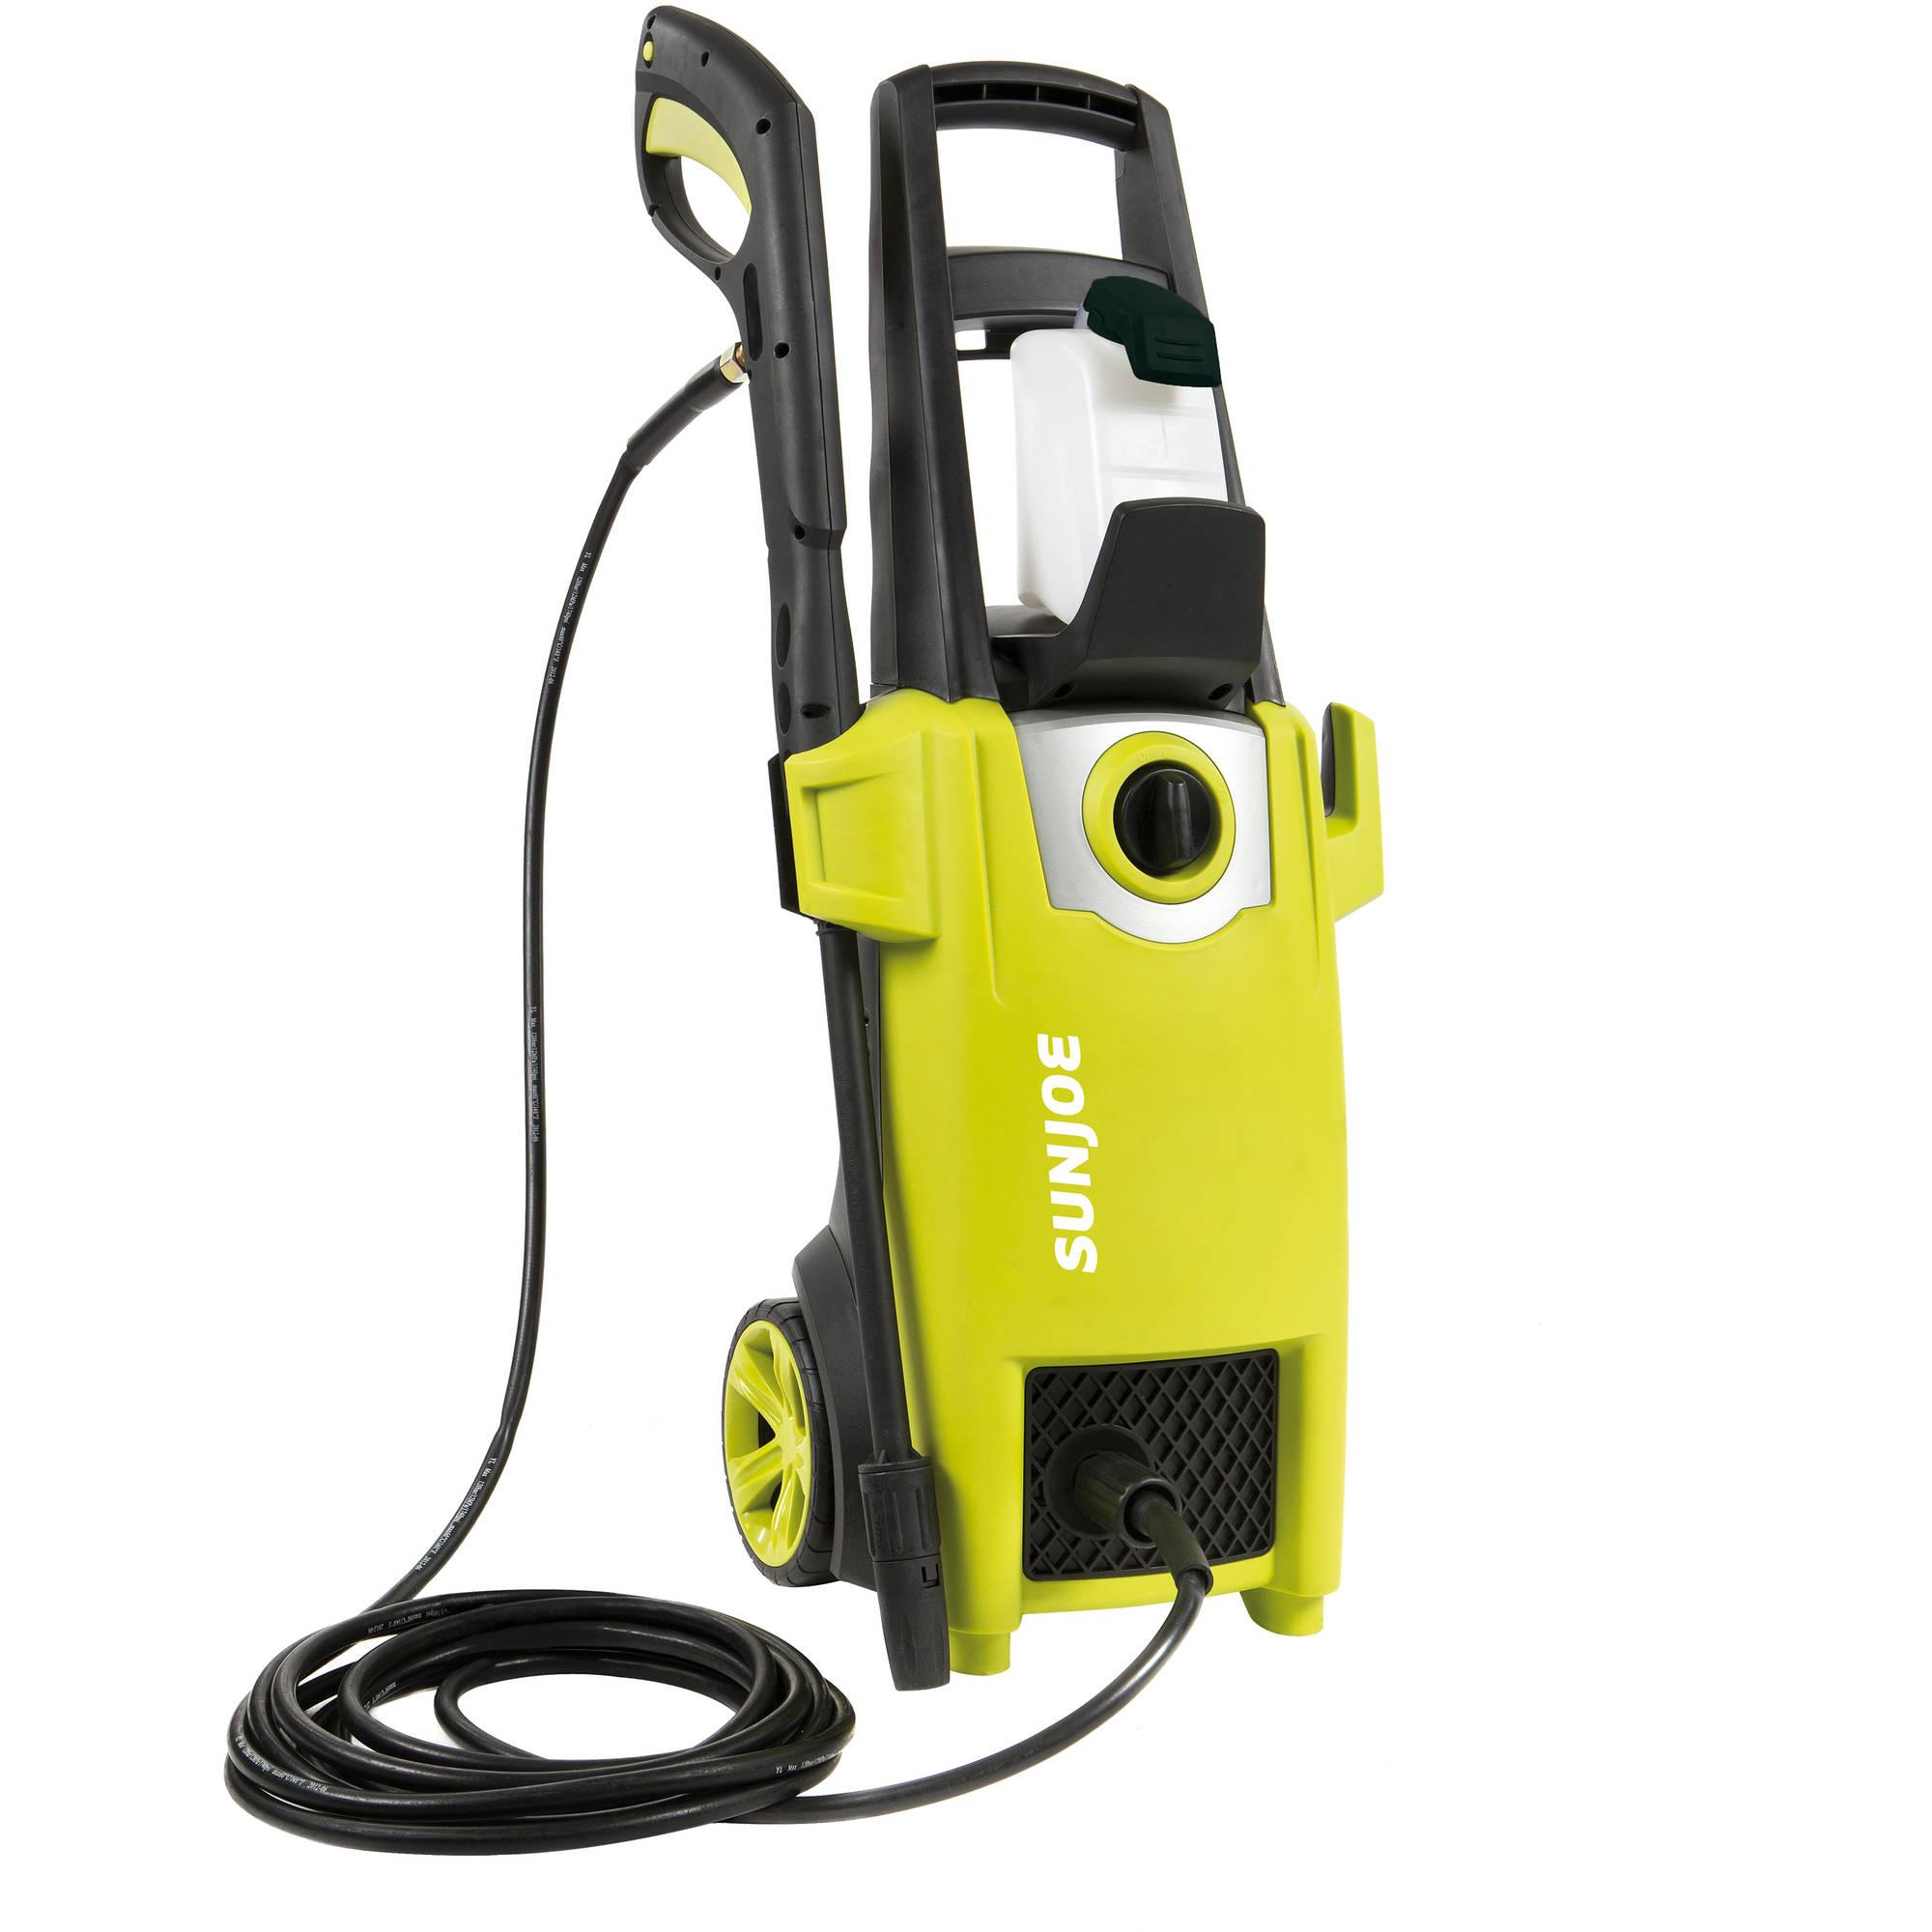 Sun Joe Pressure Joe 1740 PSI 1.59 GPM 12.5-Amp Electric Pressure Washer, SPX2000